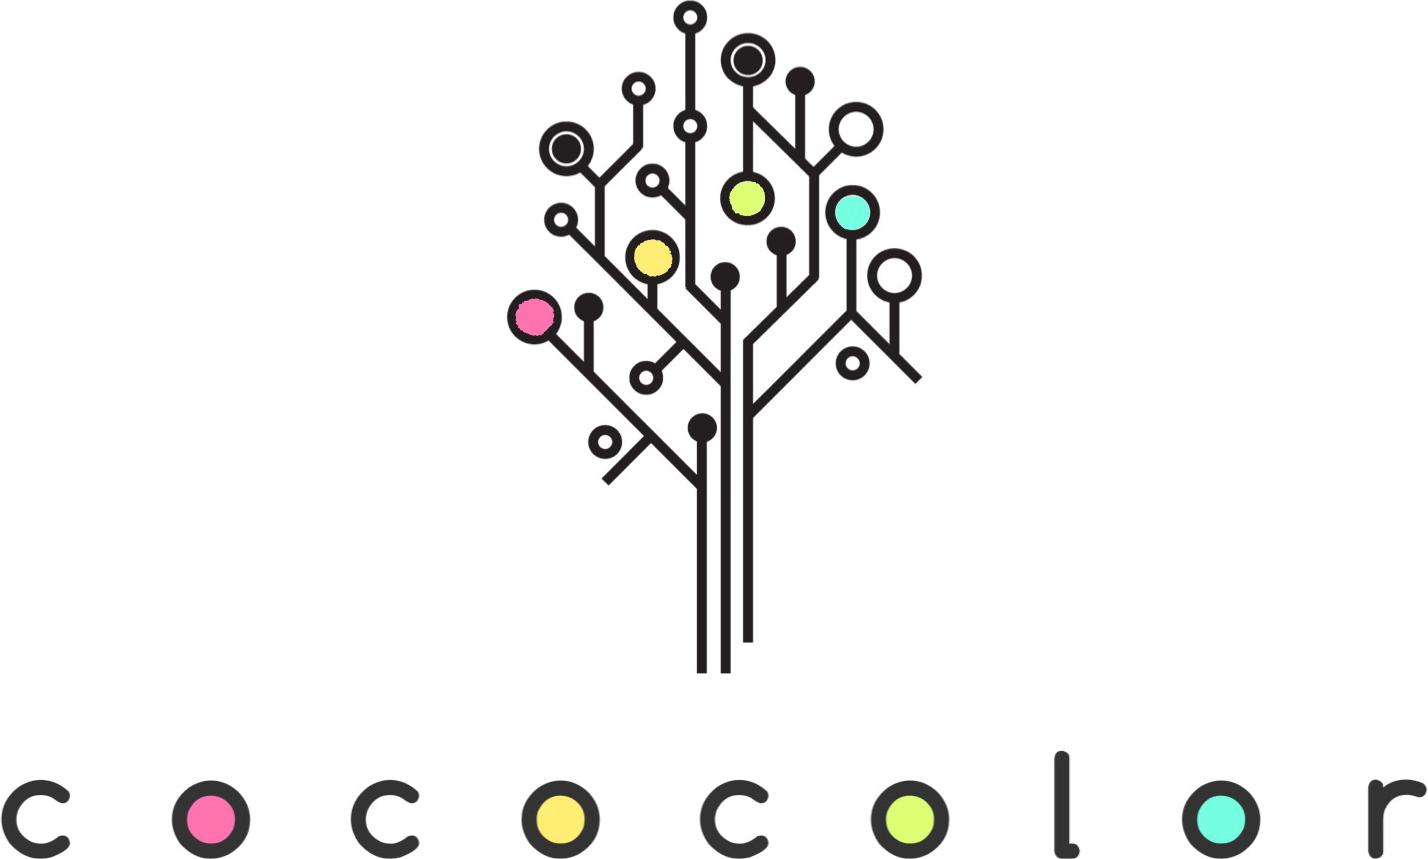 cococolo